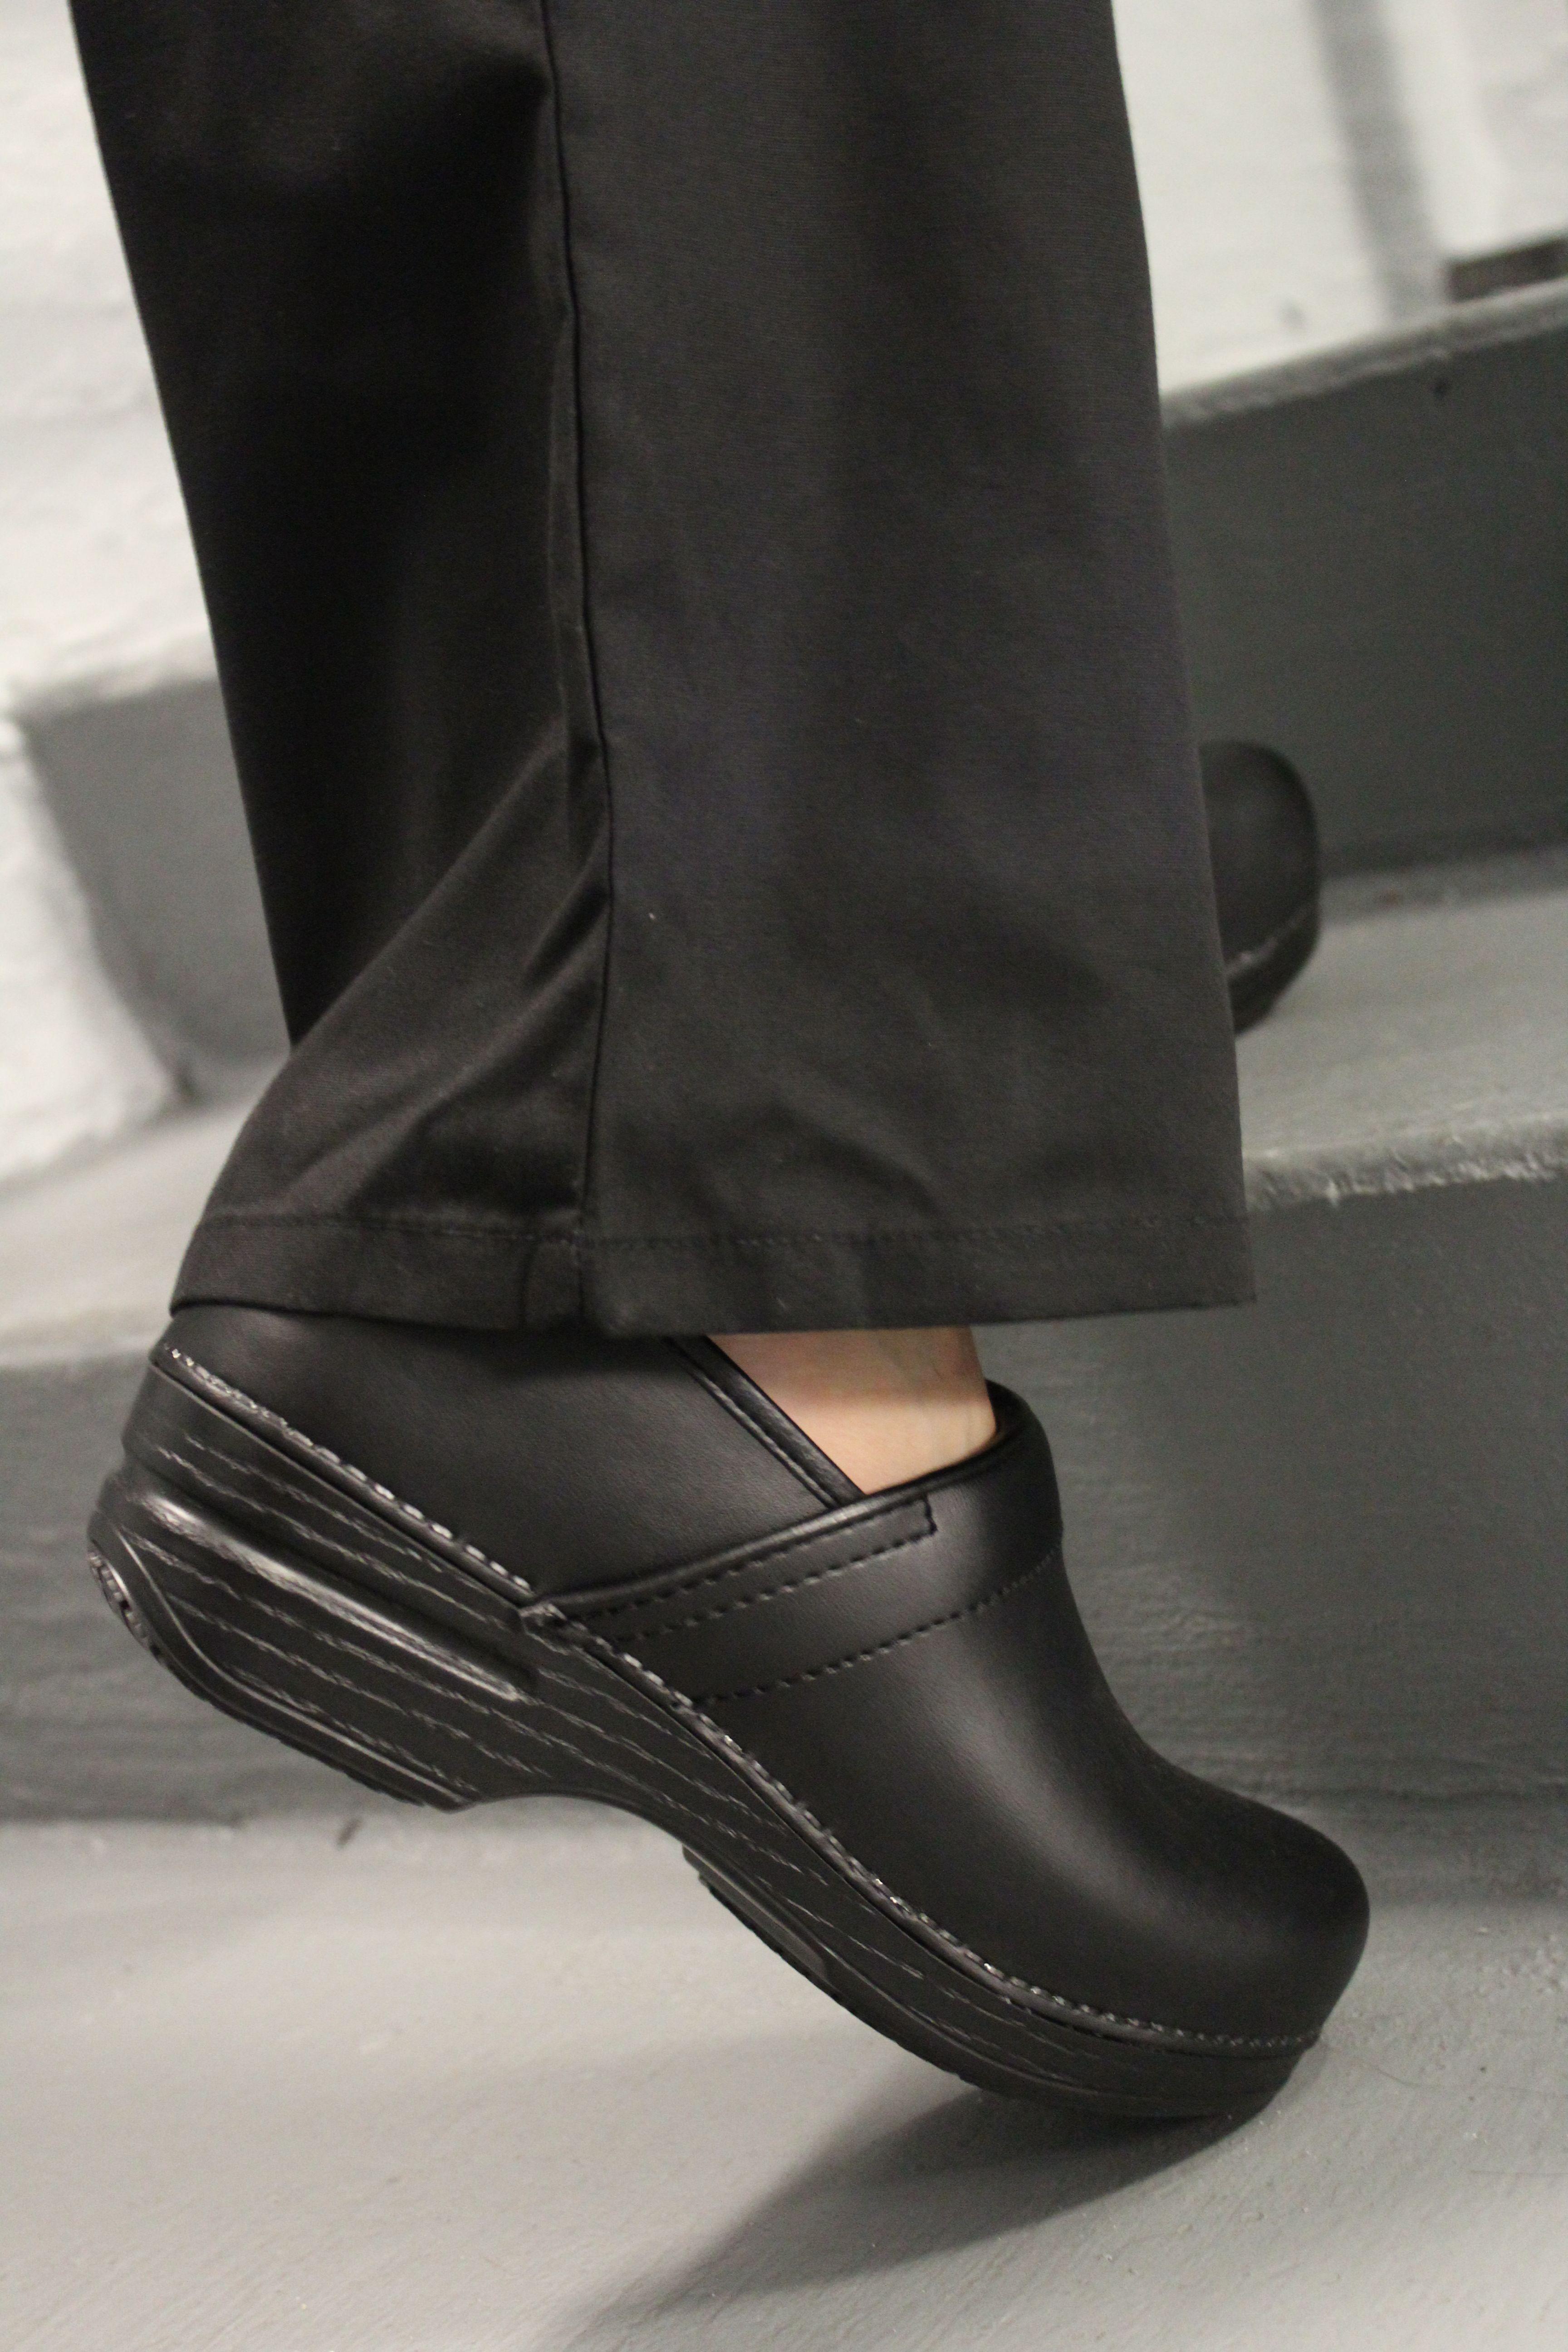 Exclusive shoes, Dansko, Leather clogs